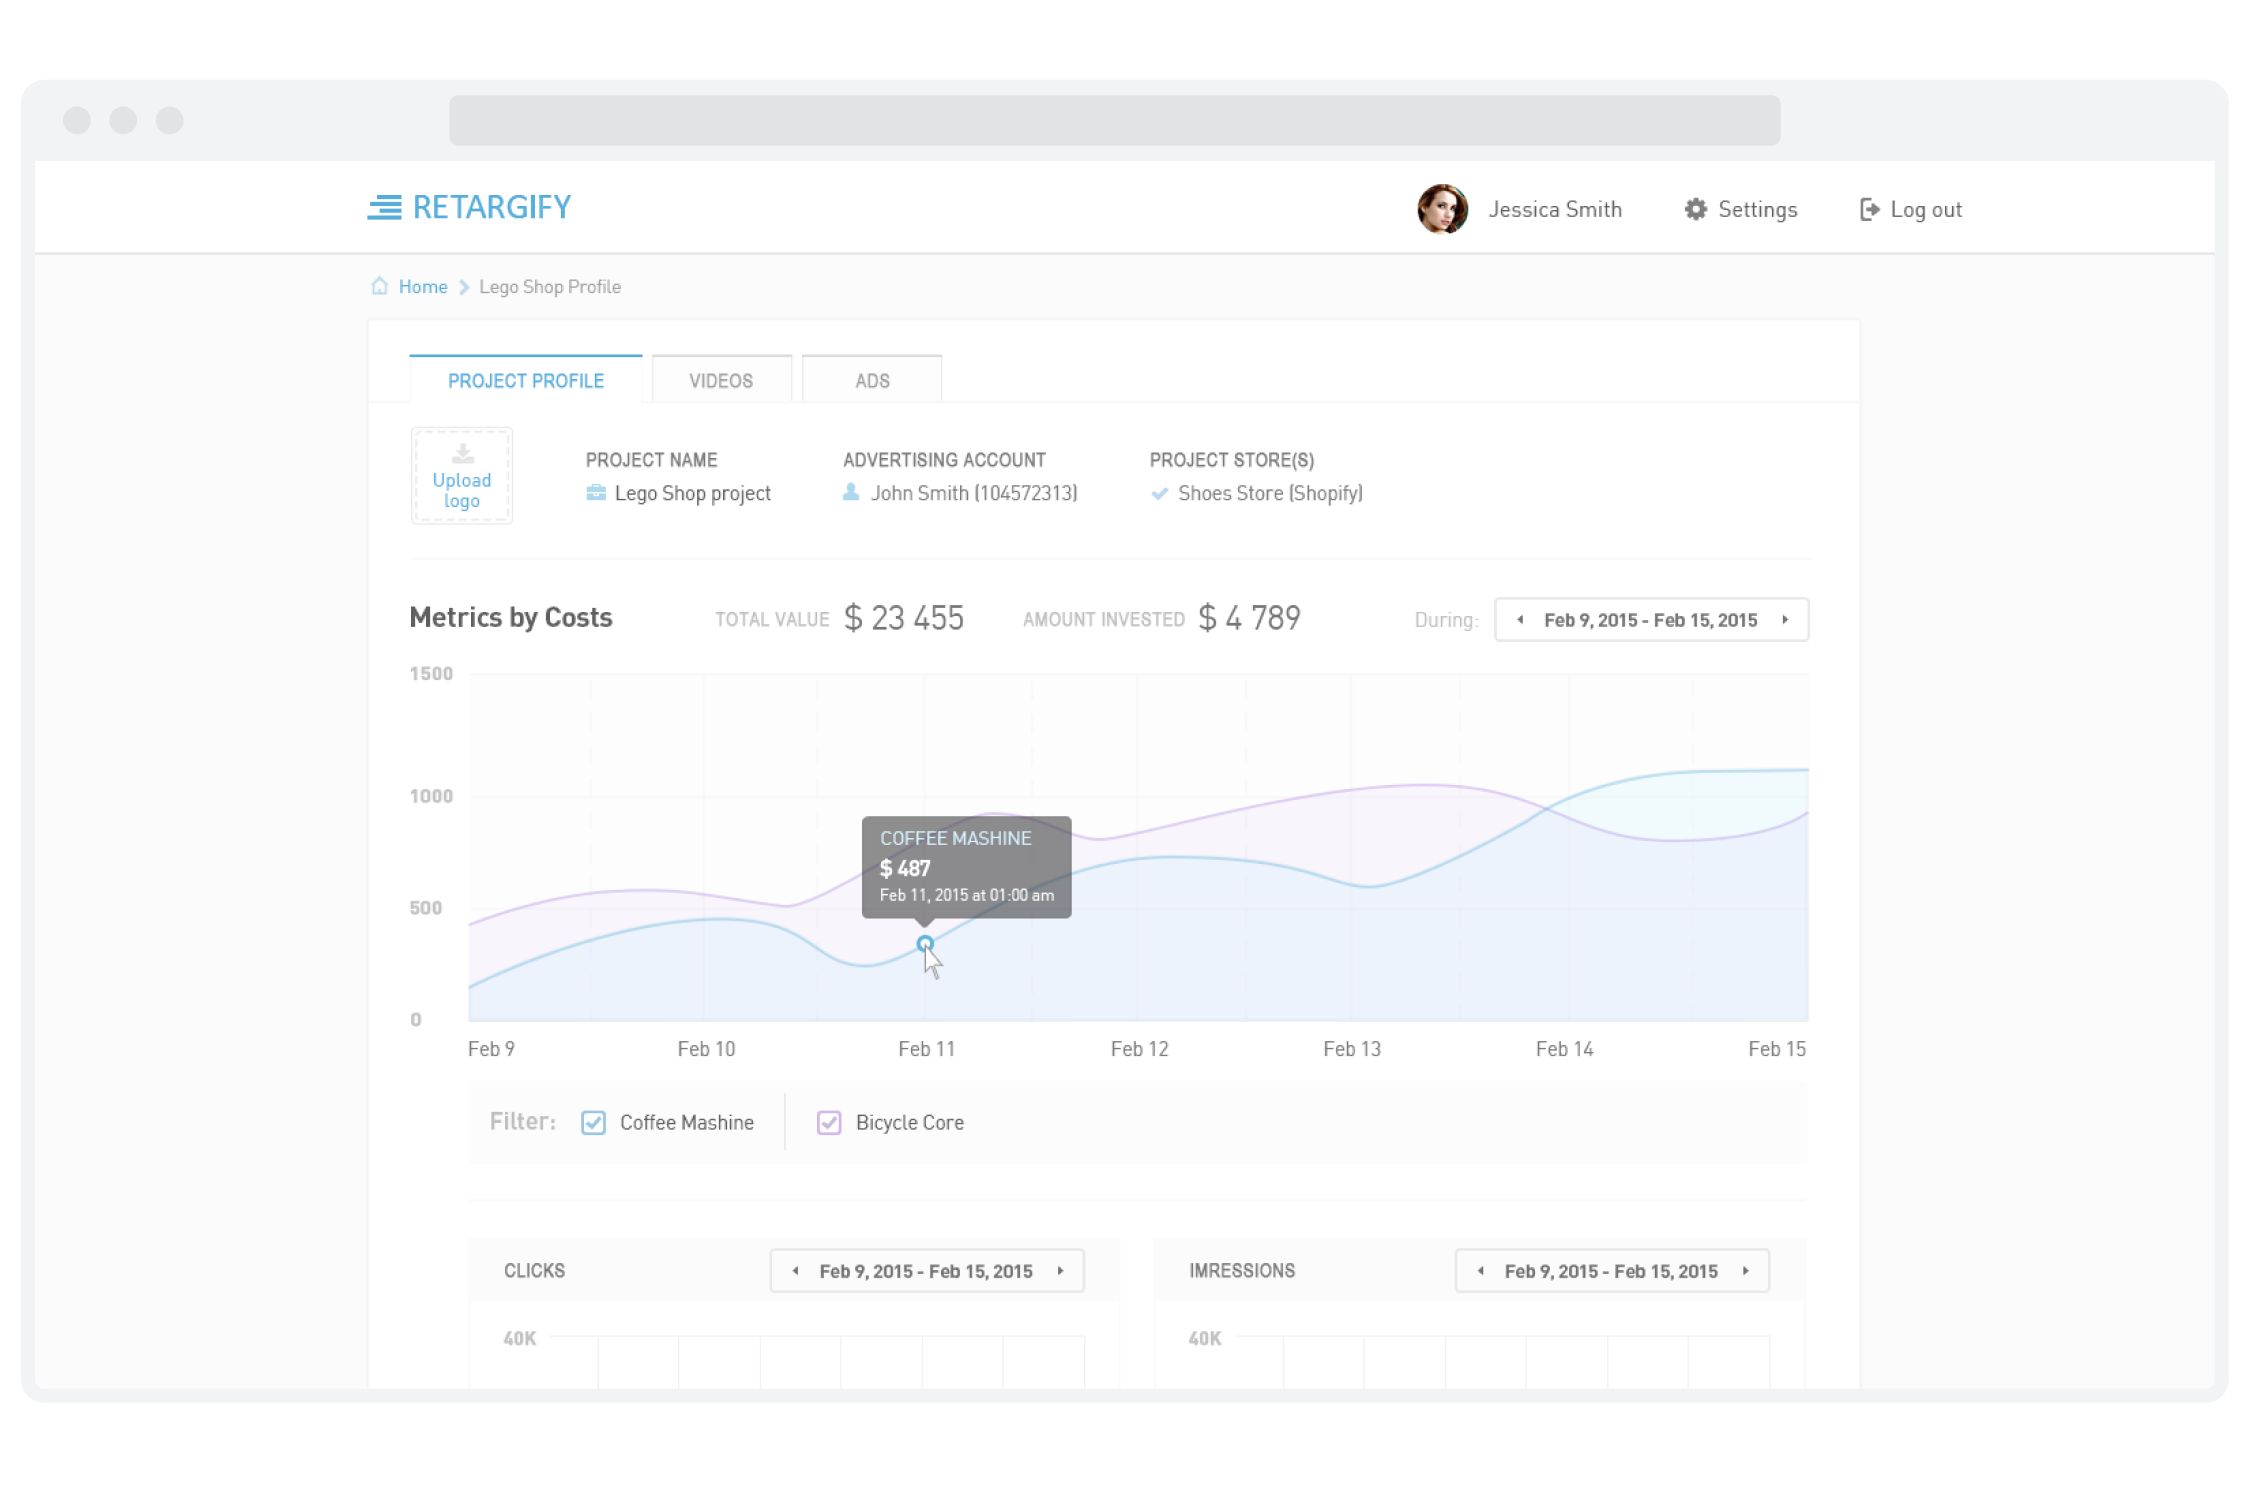 Retargify Marketing Automation Statistics Page